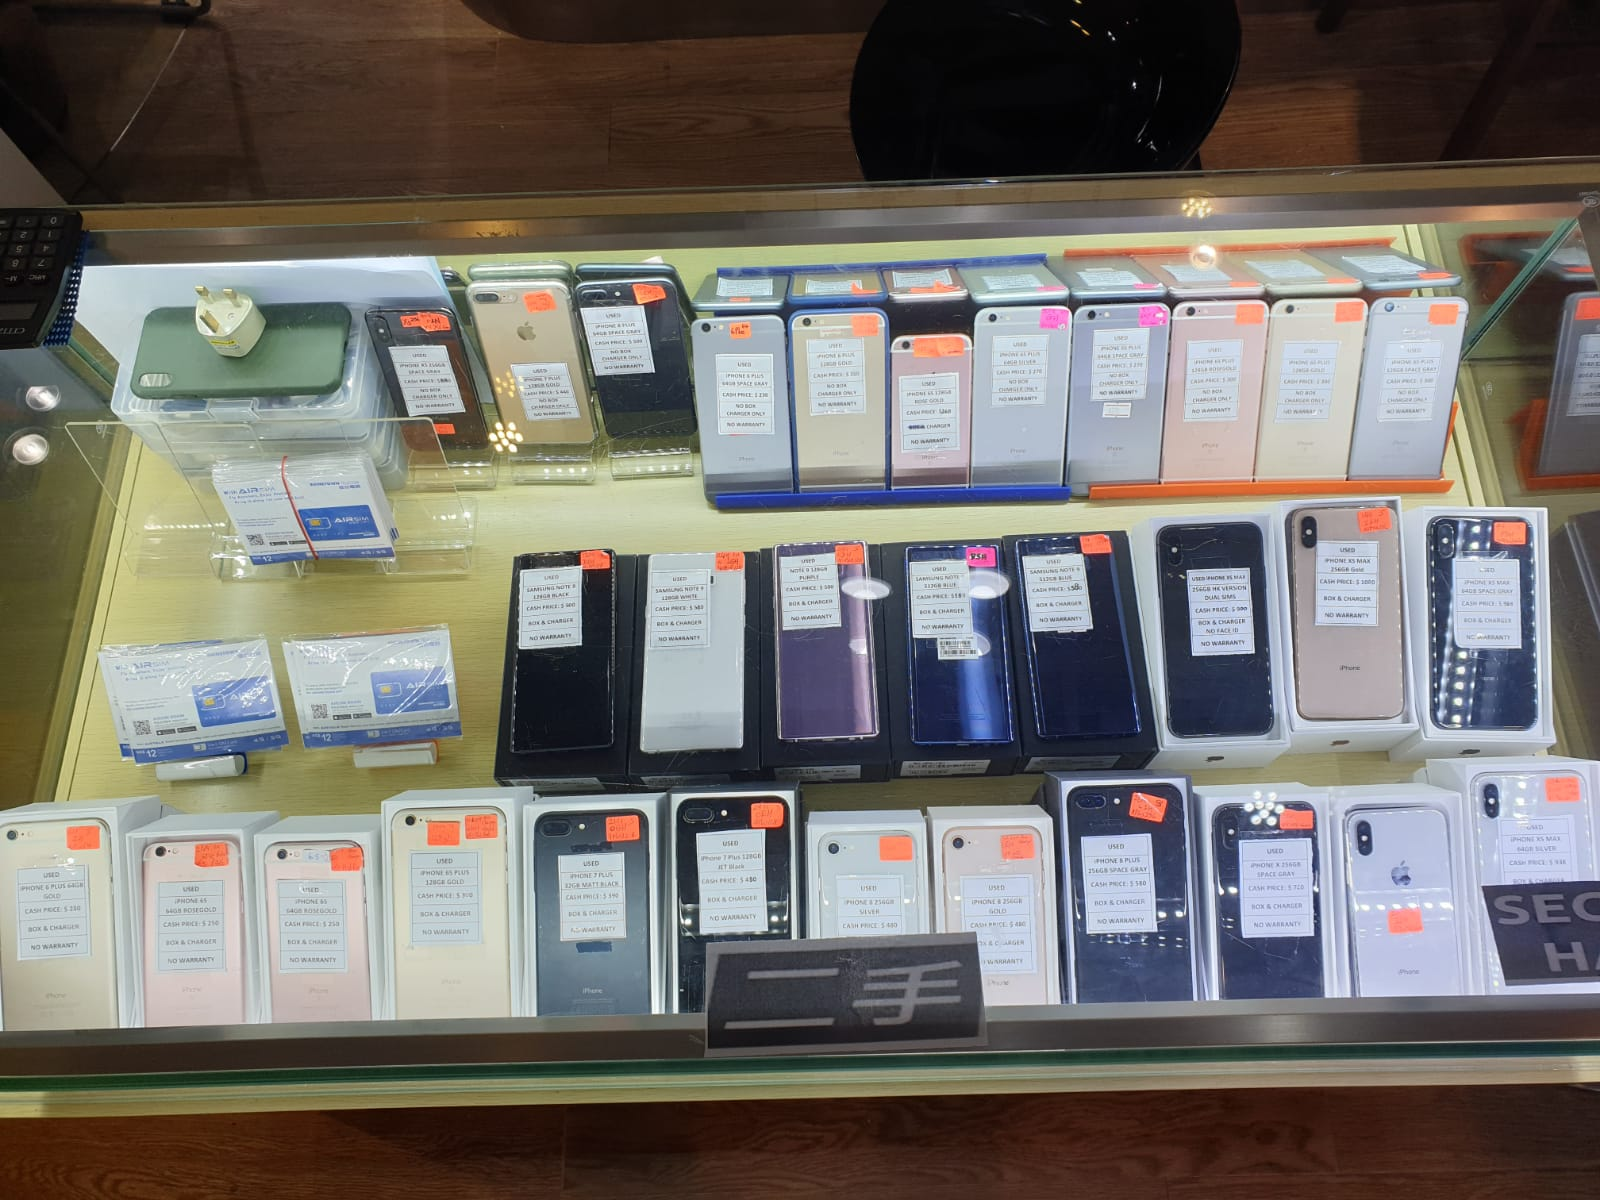 used phone singapore